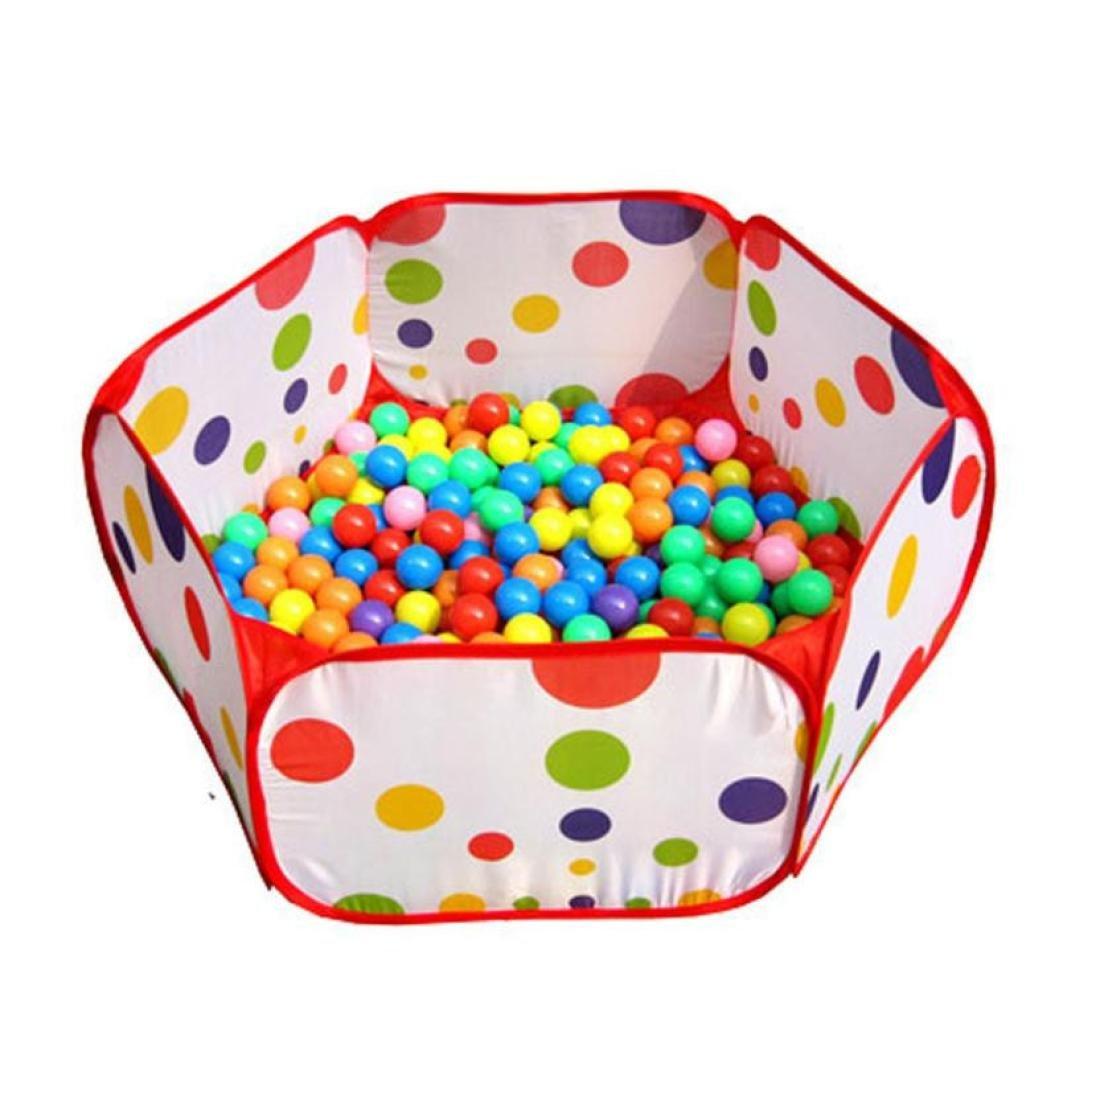 LANDFOX Pop Up Hexagon Polka Dot Children Ball PlayプールテントCarry Toteおもちゃ+ 50 Balls   B01KJGME9O